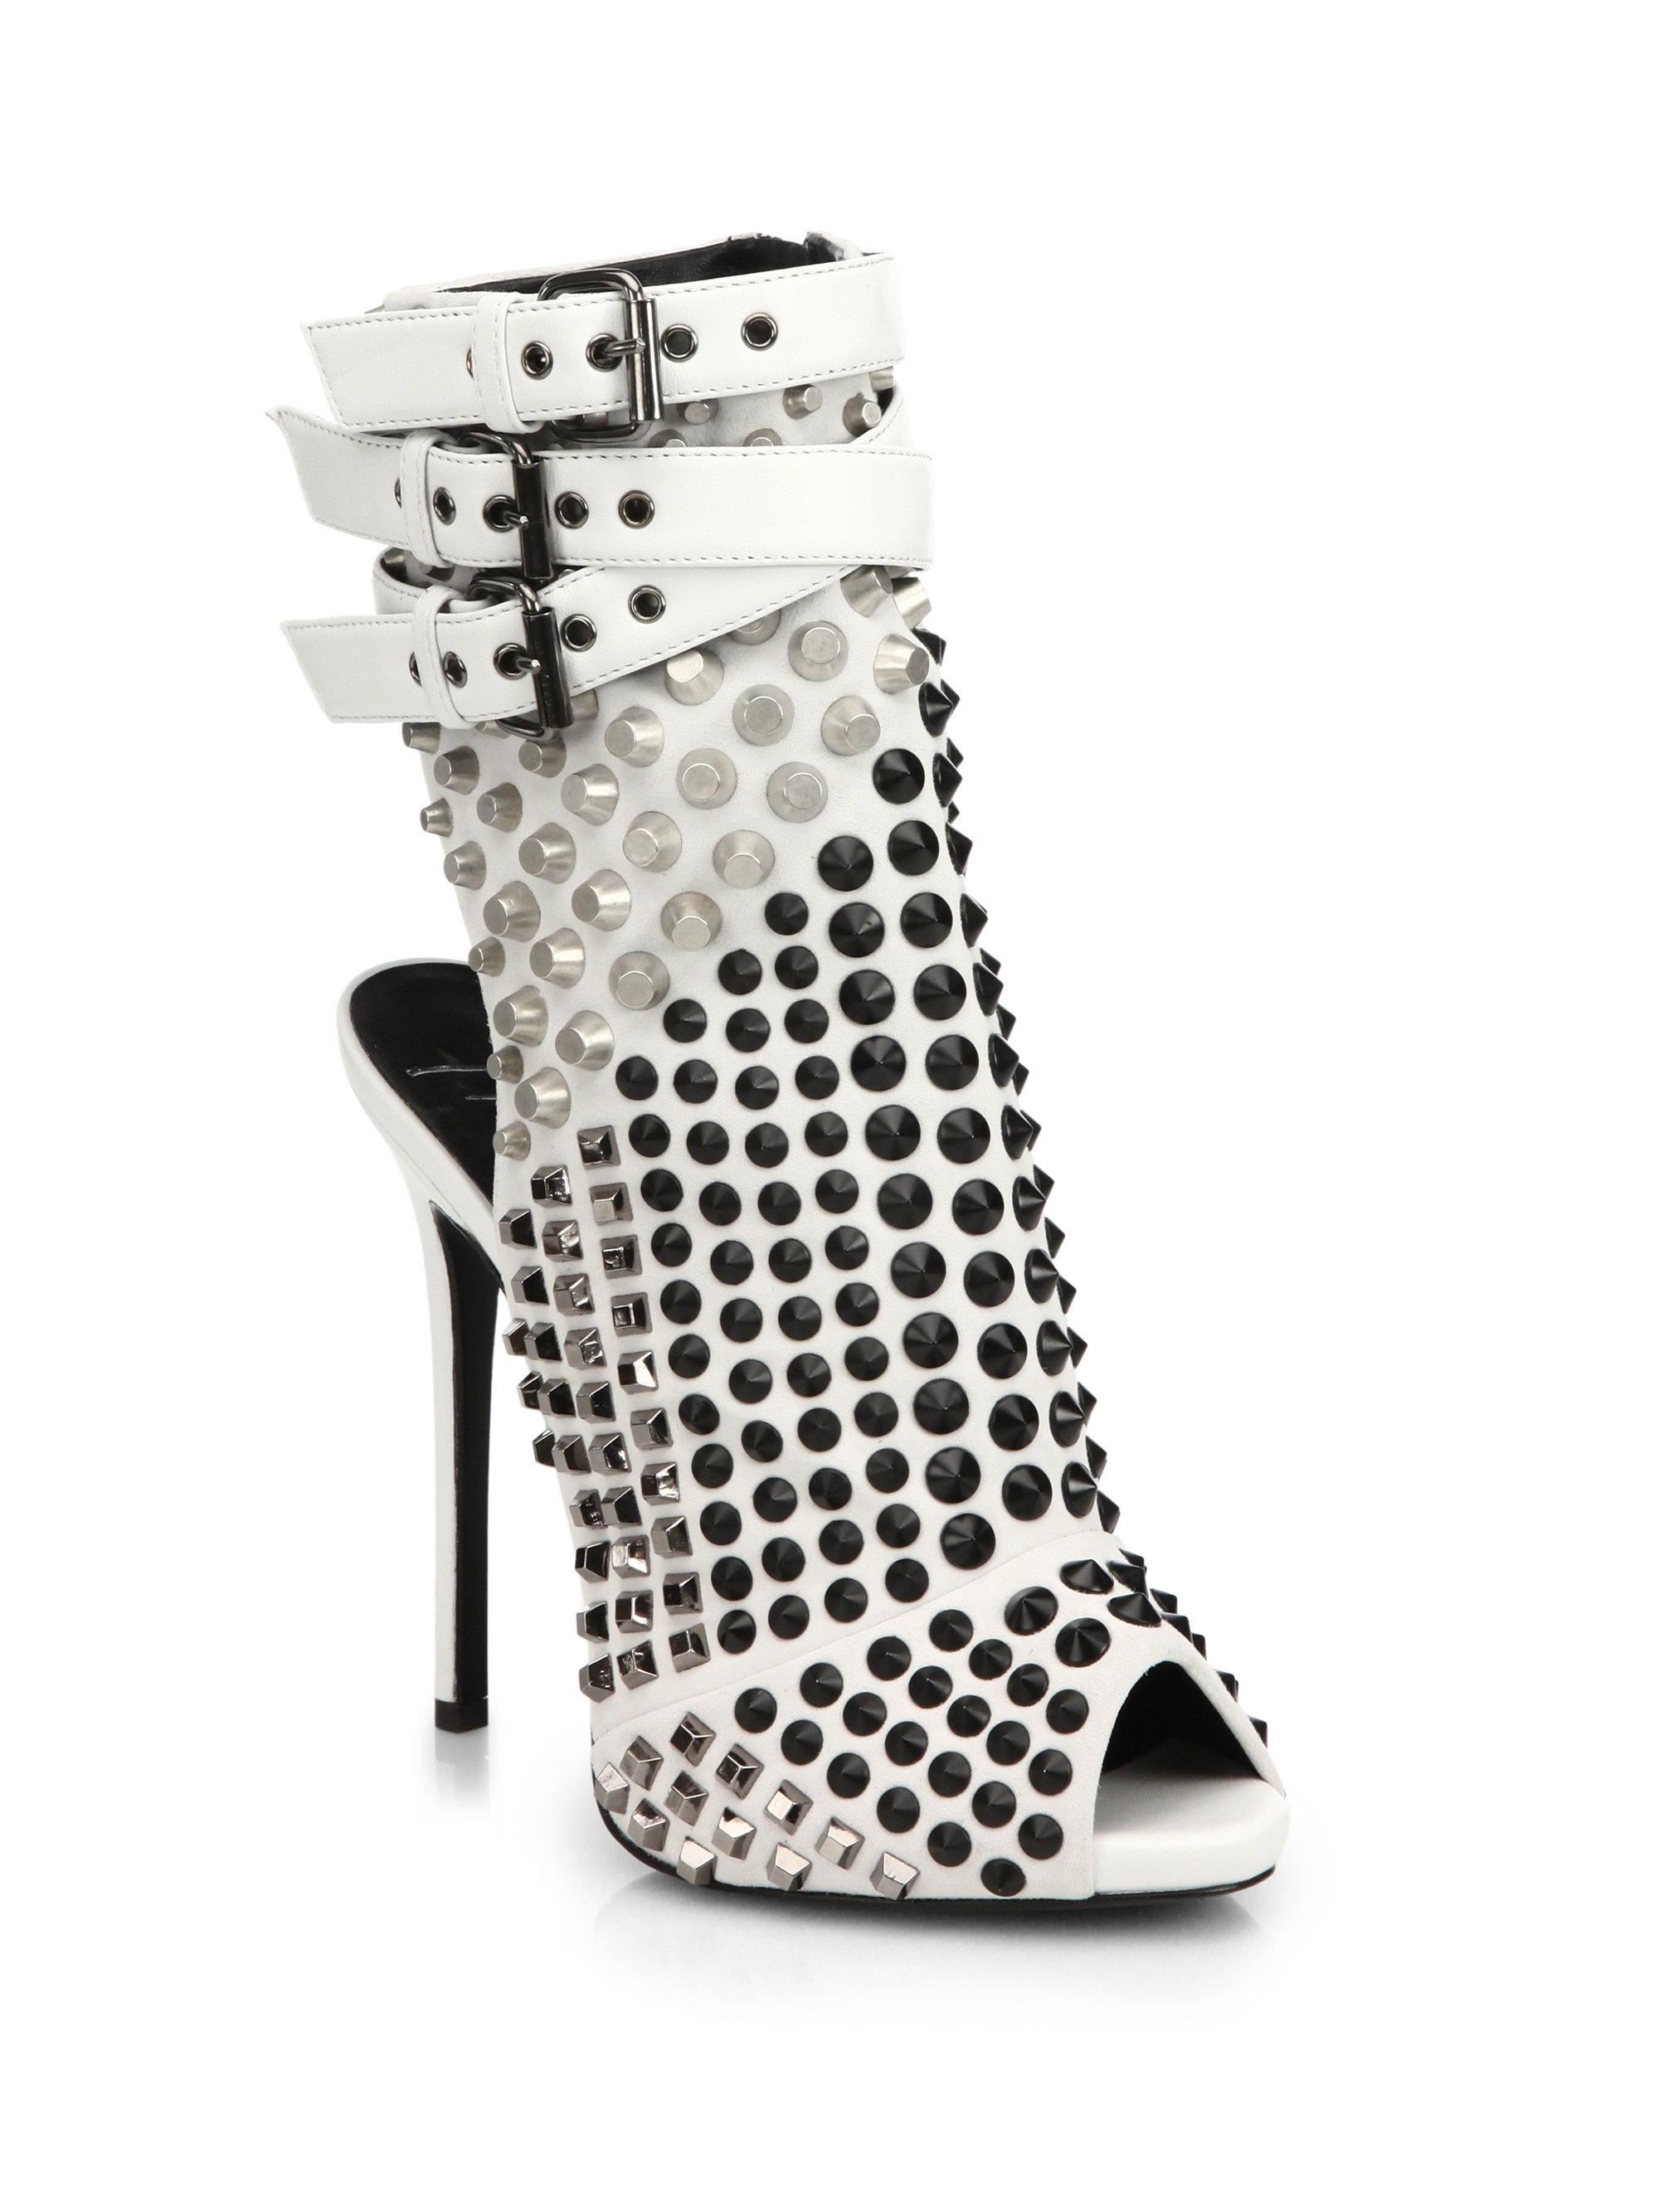 9dda0166dccf1 Giuseppe Zanotti Studded Platform Ankle Boot Sandals in White - Lyst